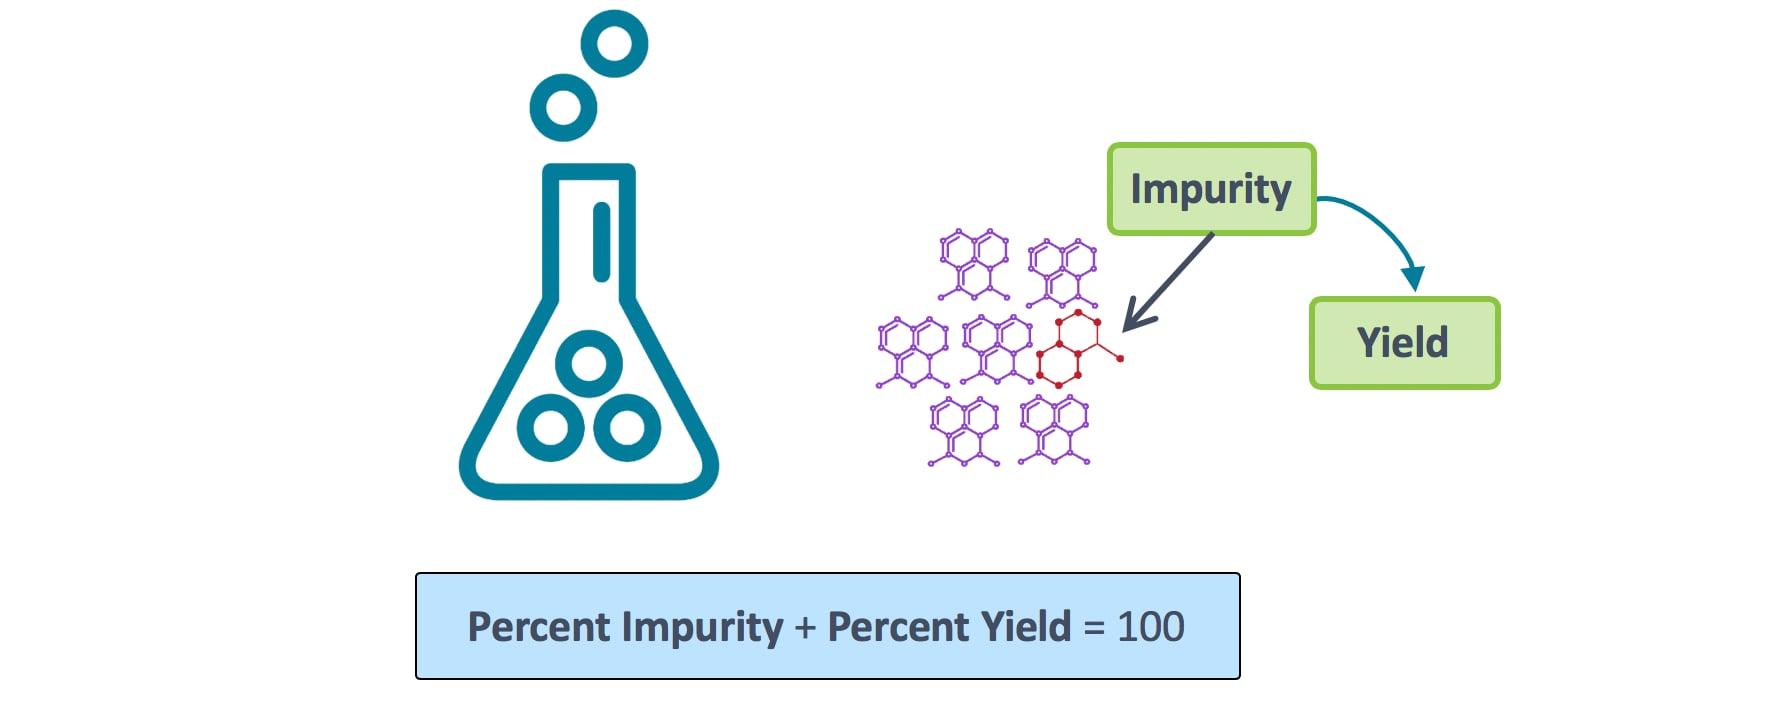 mlr-impurity-diagram